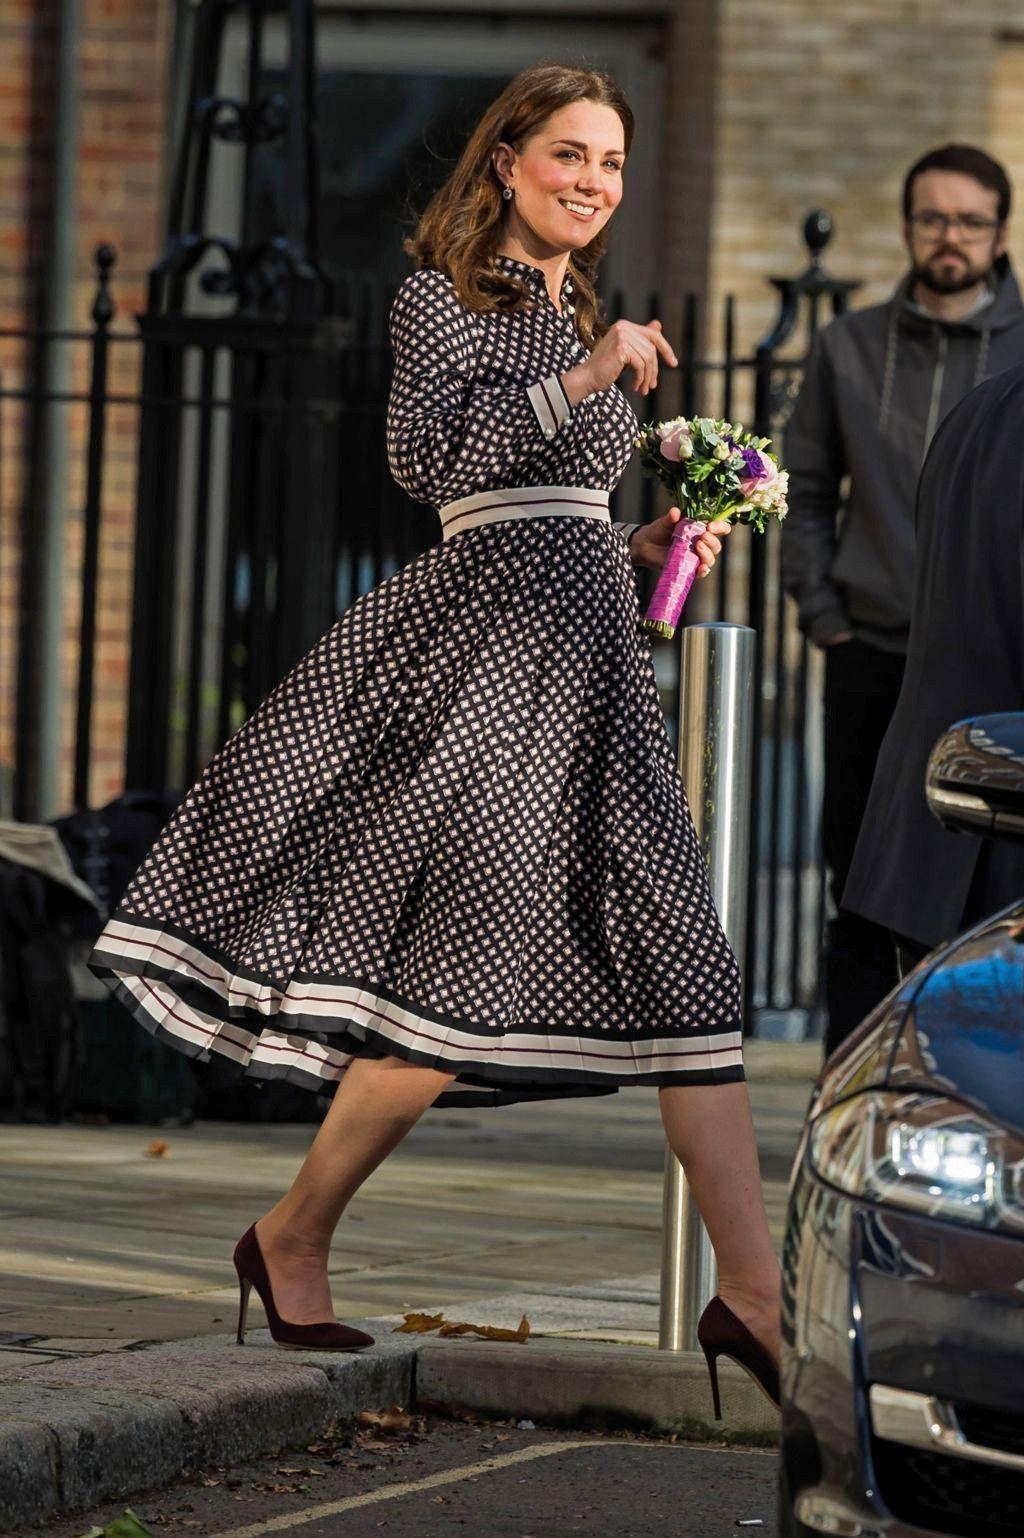 6f974b957e424 Kate Spade's best fashion designs on celebrities. Catherine, Duchess of  Cambridge